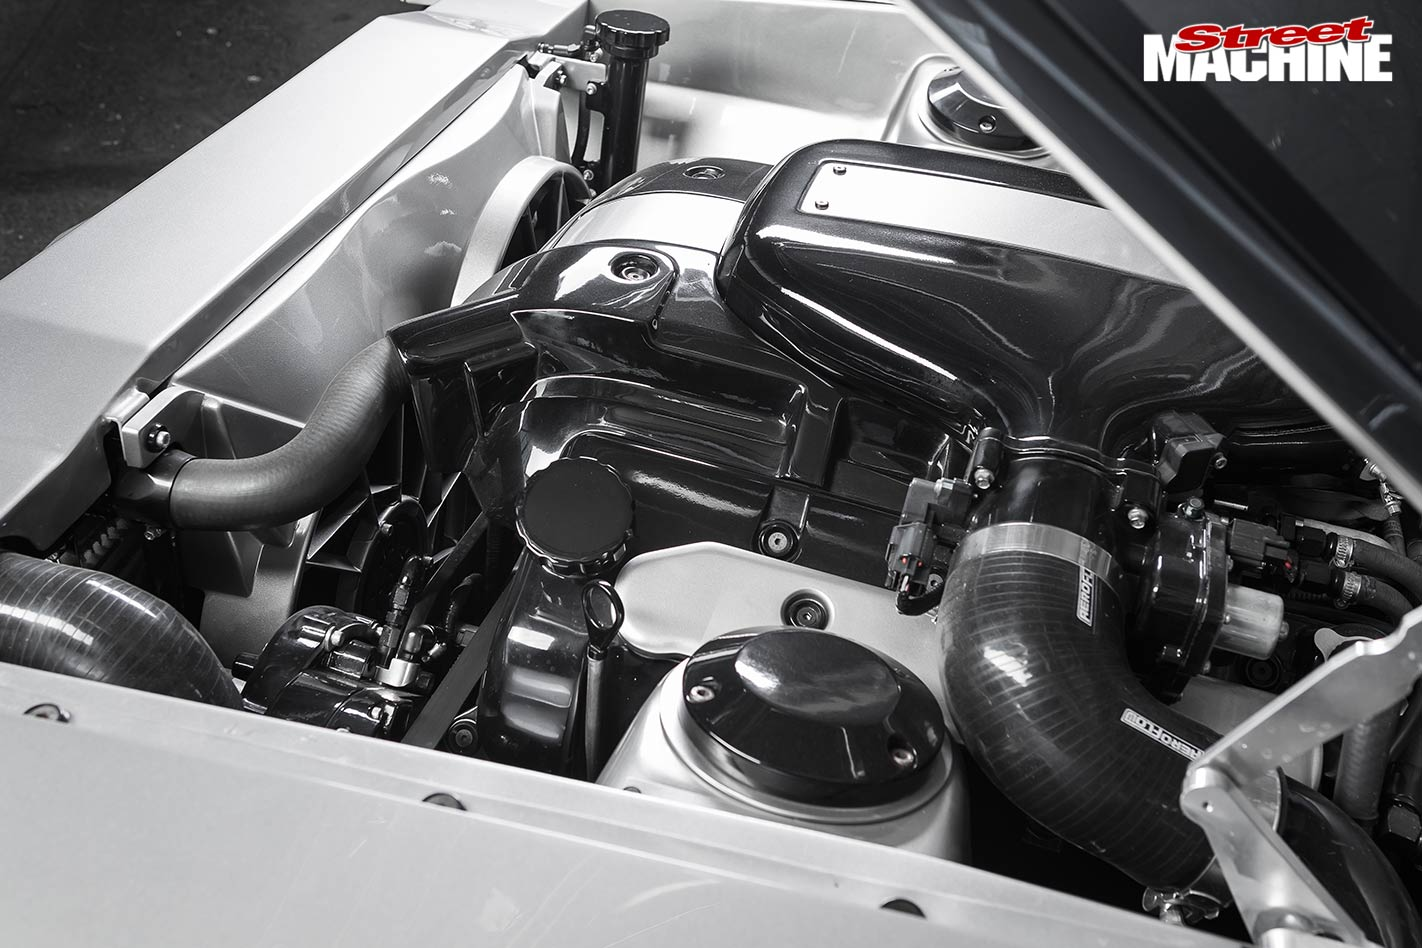 Ford XY Falcon engine